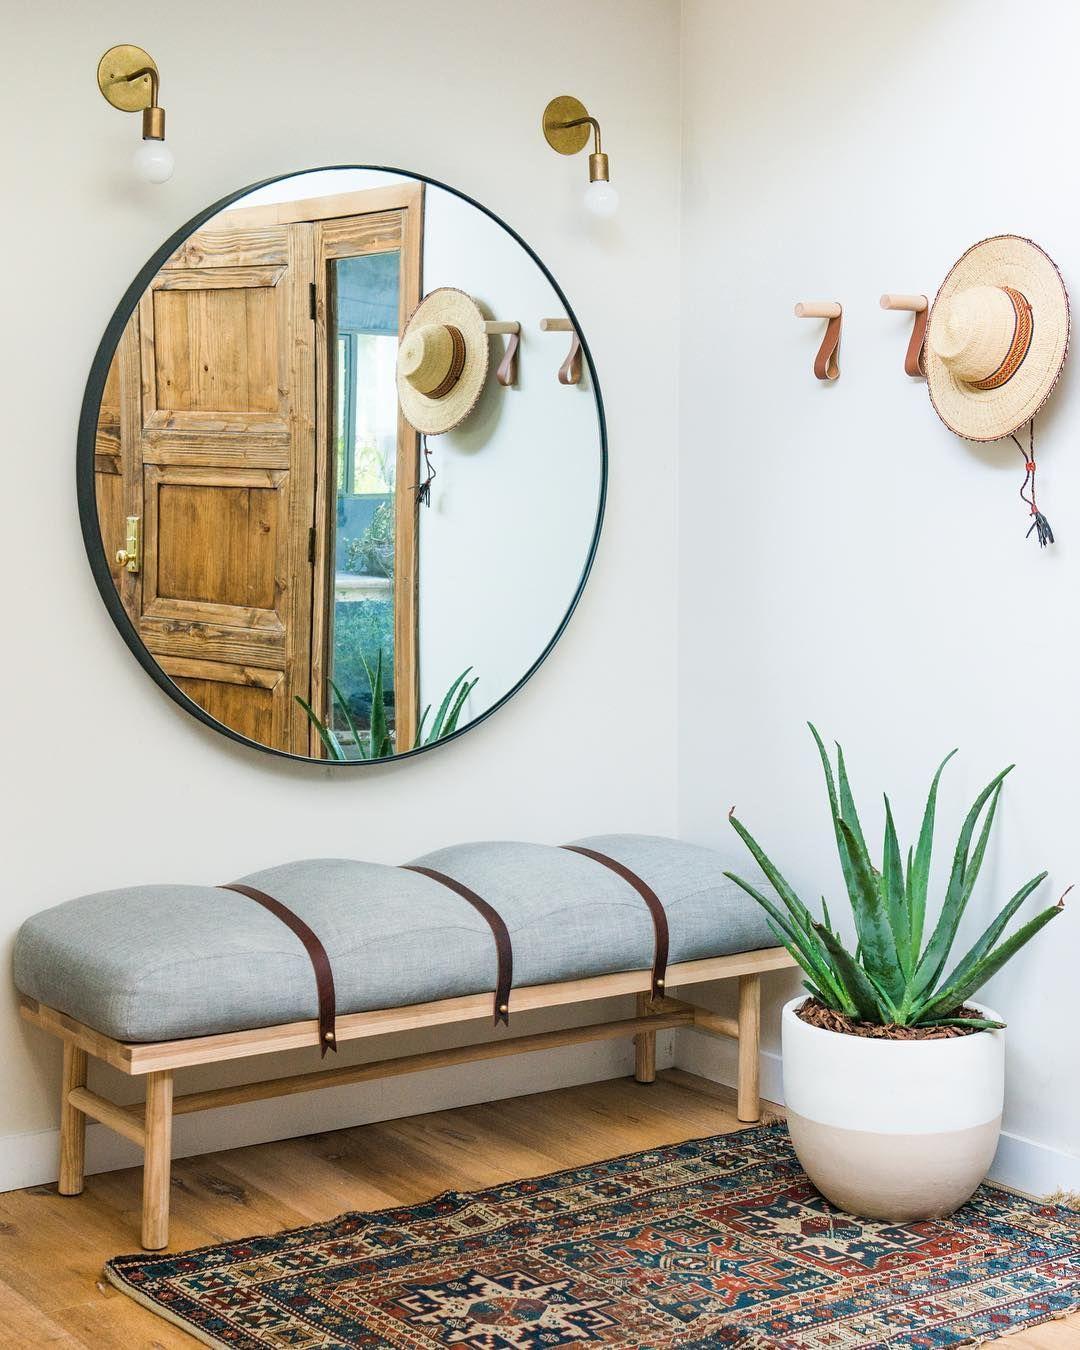 Croft house round chambers mirror entrance decor modern